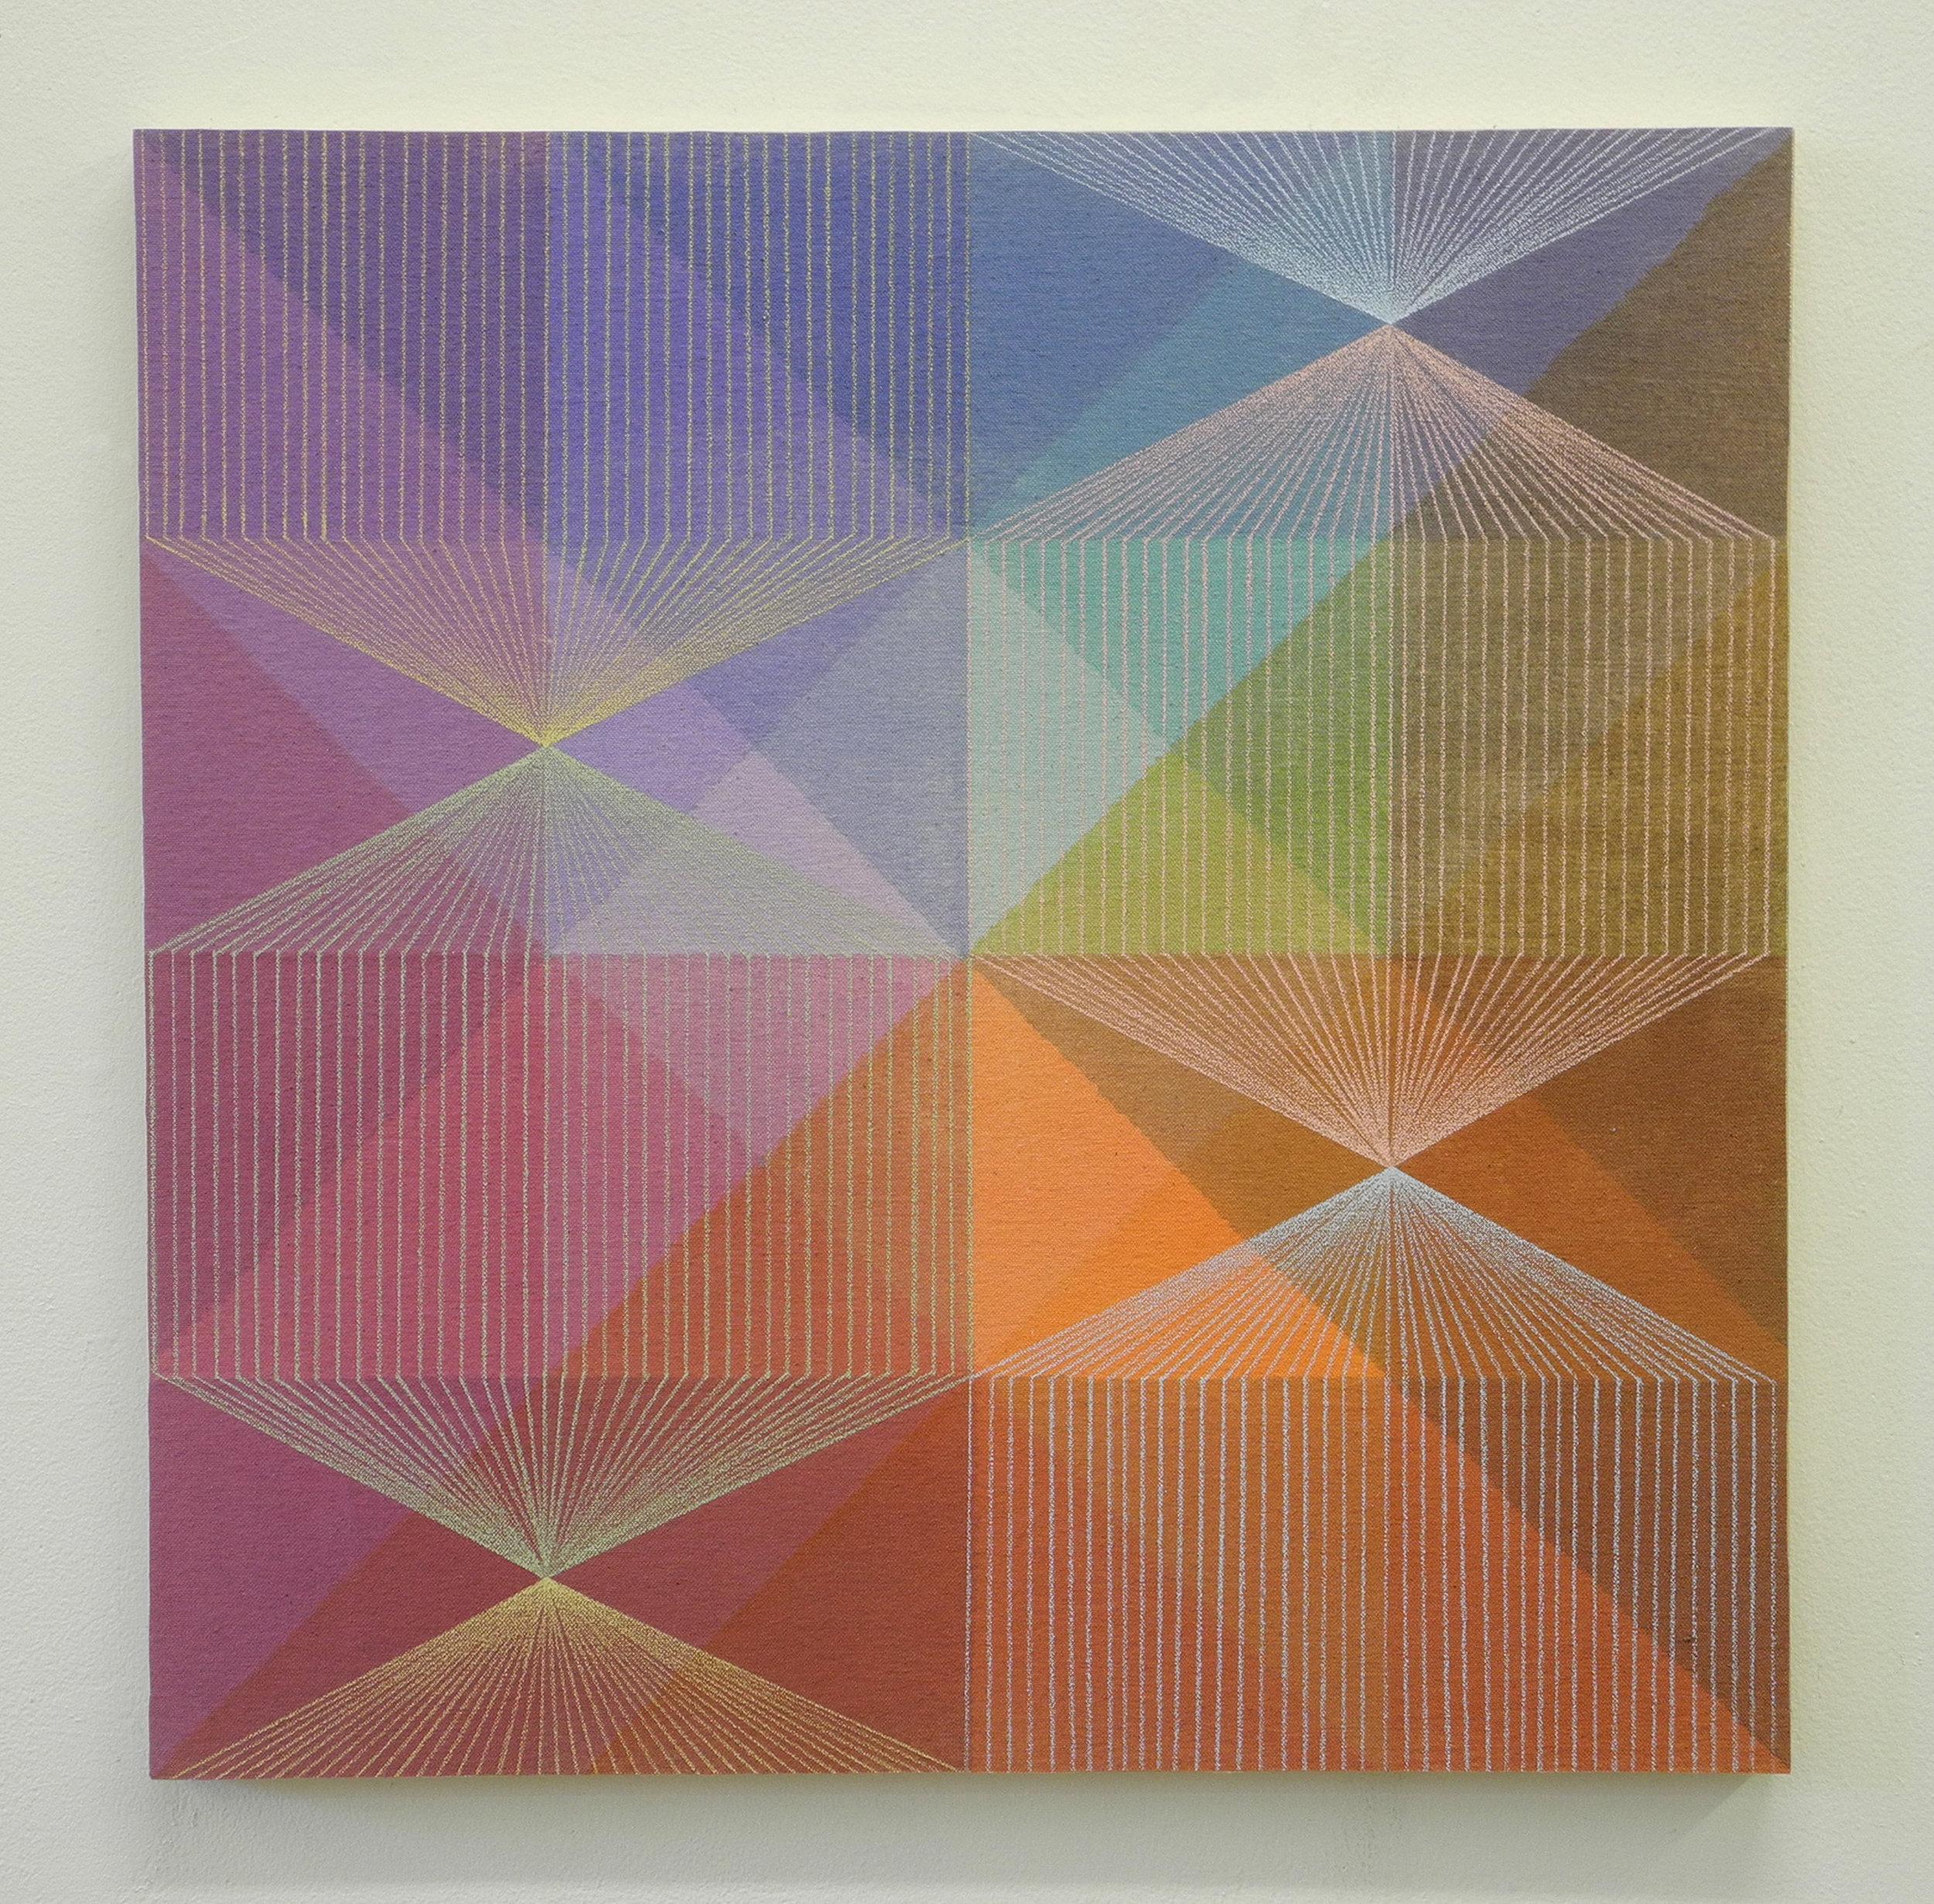 Panel Paintings 2016 - 2018